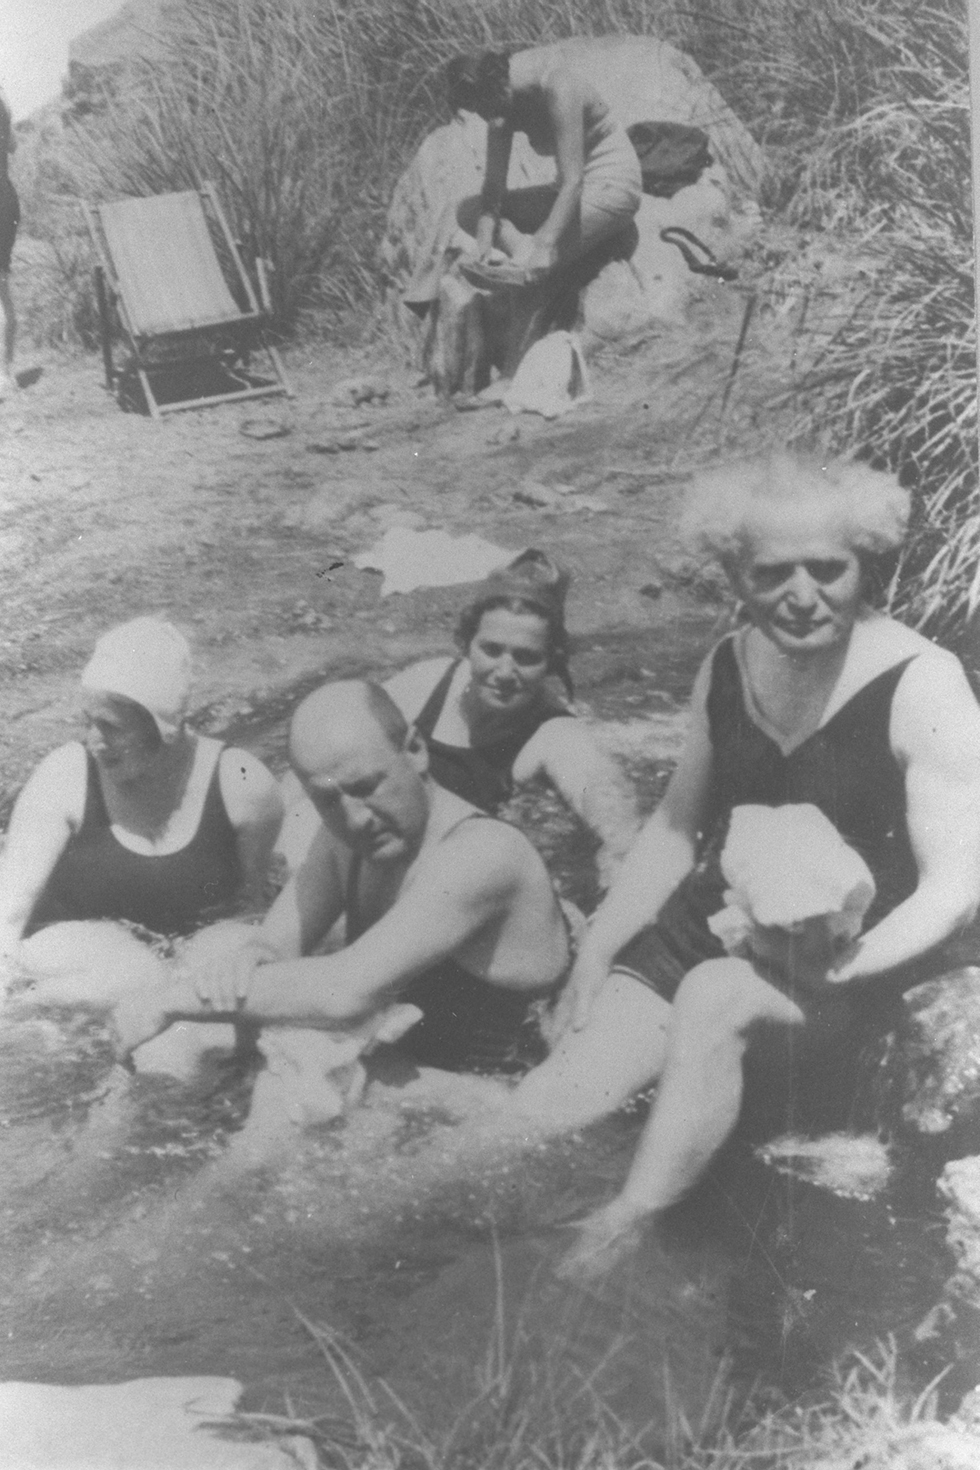 David Ben-Gurion and Eliezer Kaplan at Ein Feshkha, 1940 (Photo: Government Press Office)